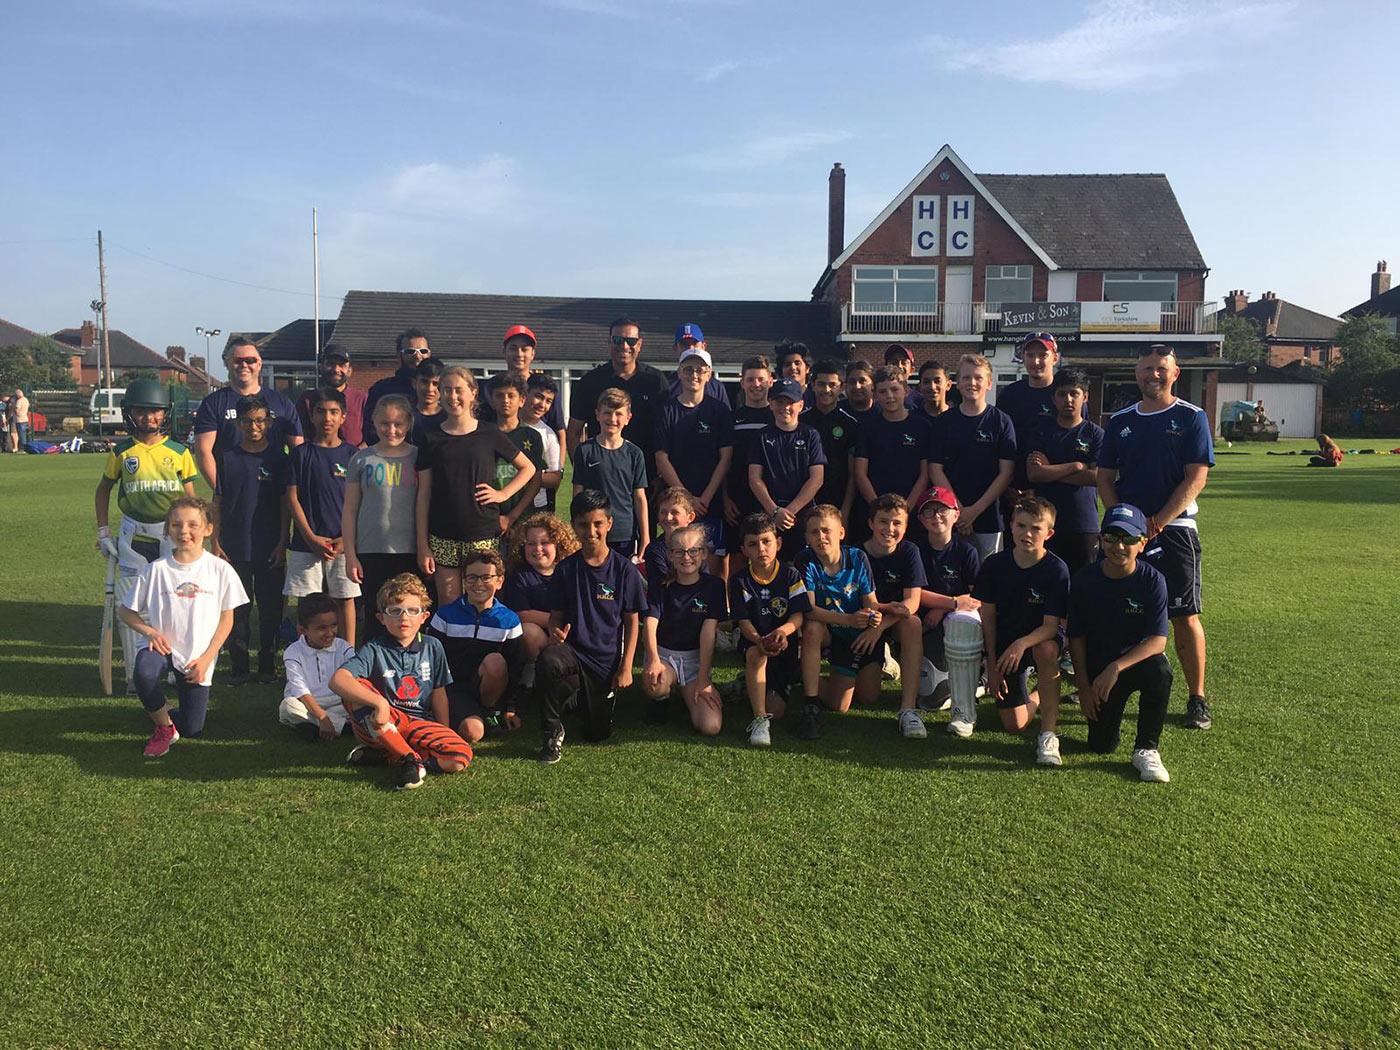 VVS Laxman at Hanging Heaton Cricket Club